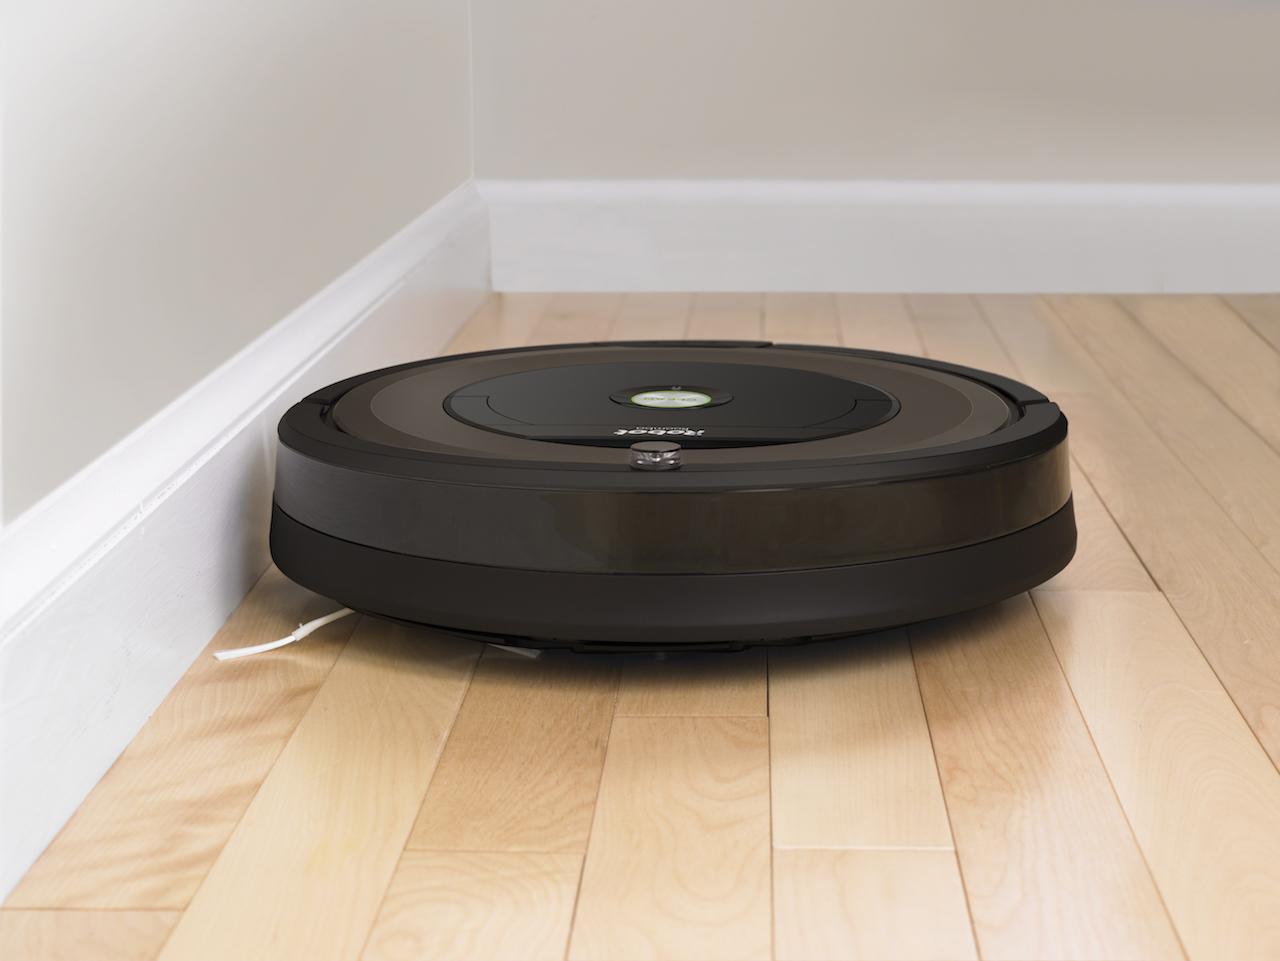 I robot aspirapolvere roomba serie 600 e serie 800 for Roomba aspirapolvere e lavapavimenti